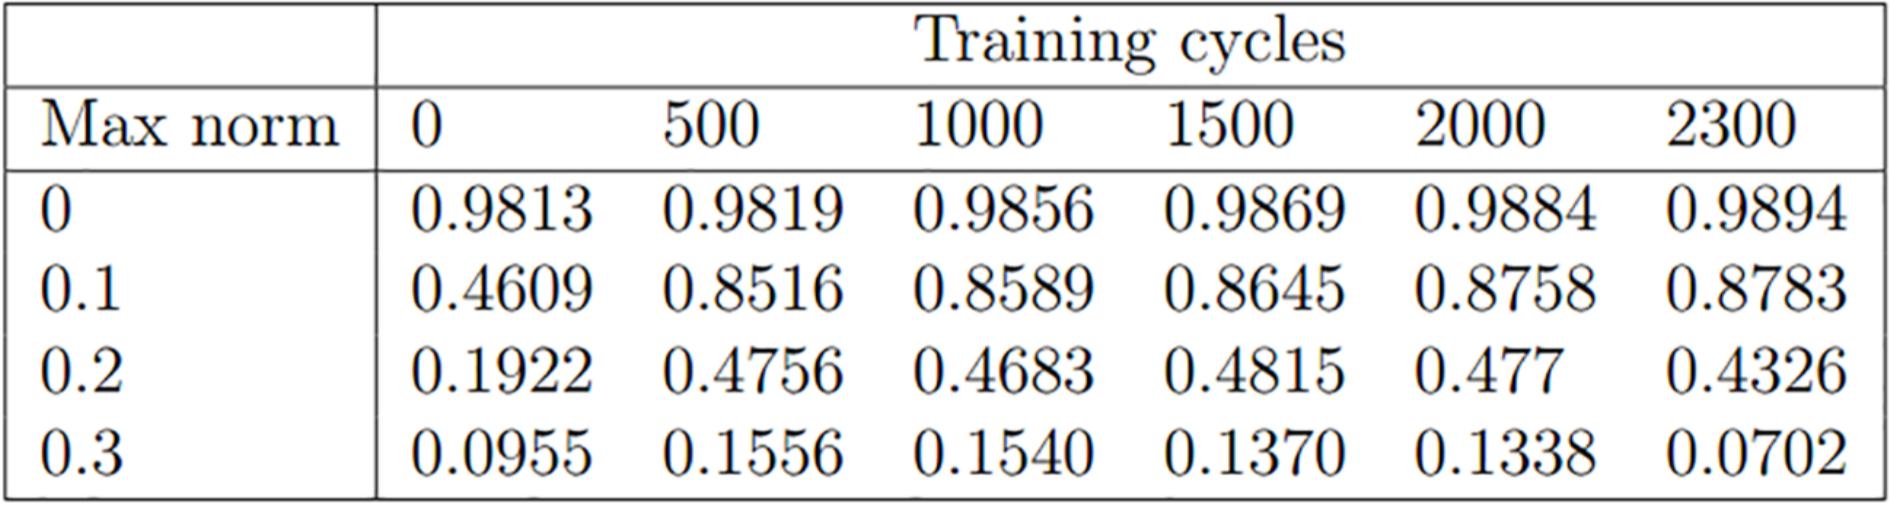 Table 1: Adversarial accuracy, 2:1 training ratio